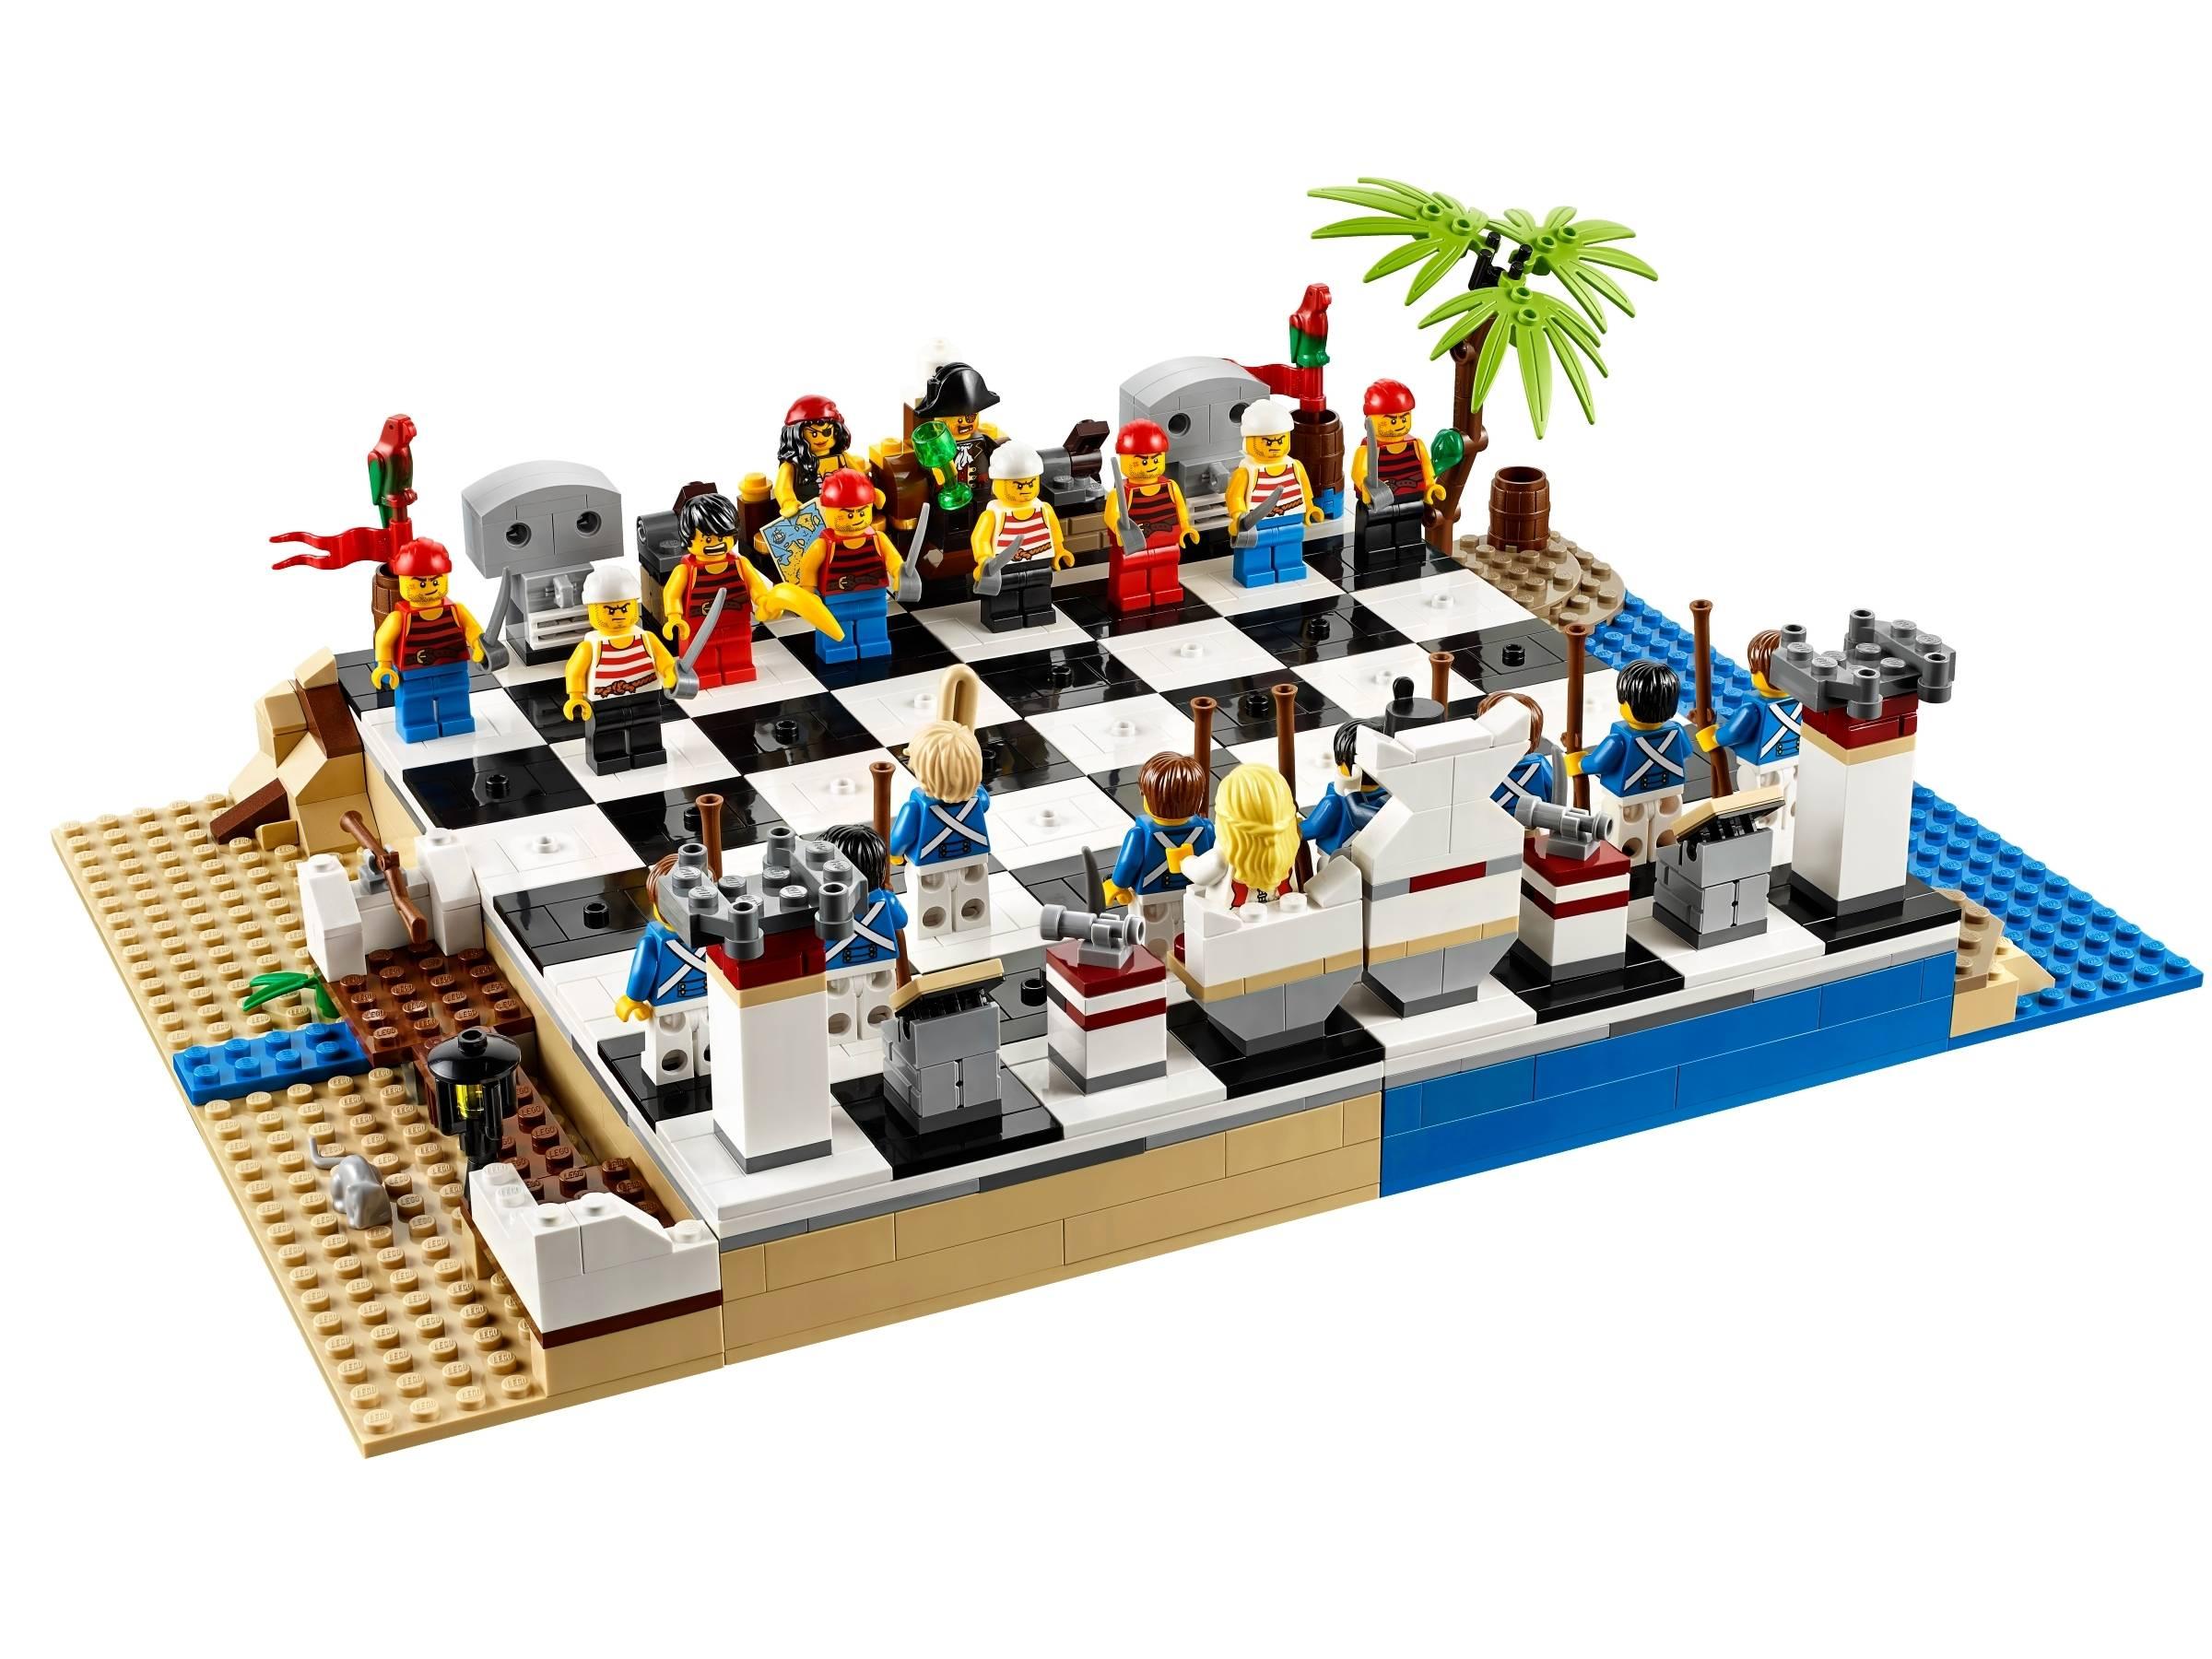 1. LEGO Pirate Chess Set